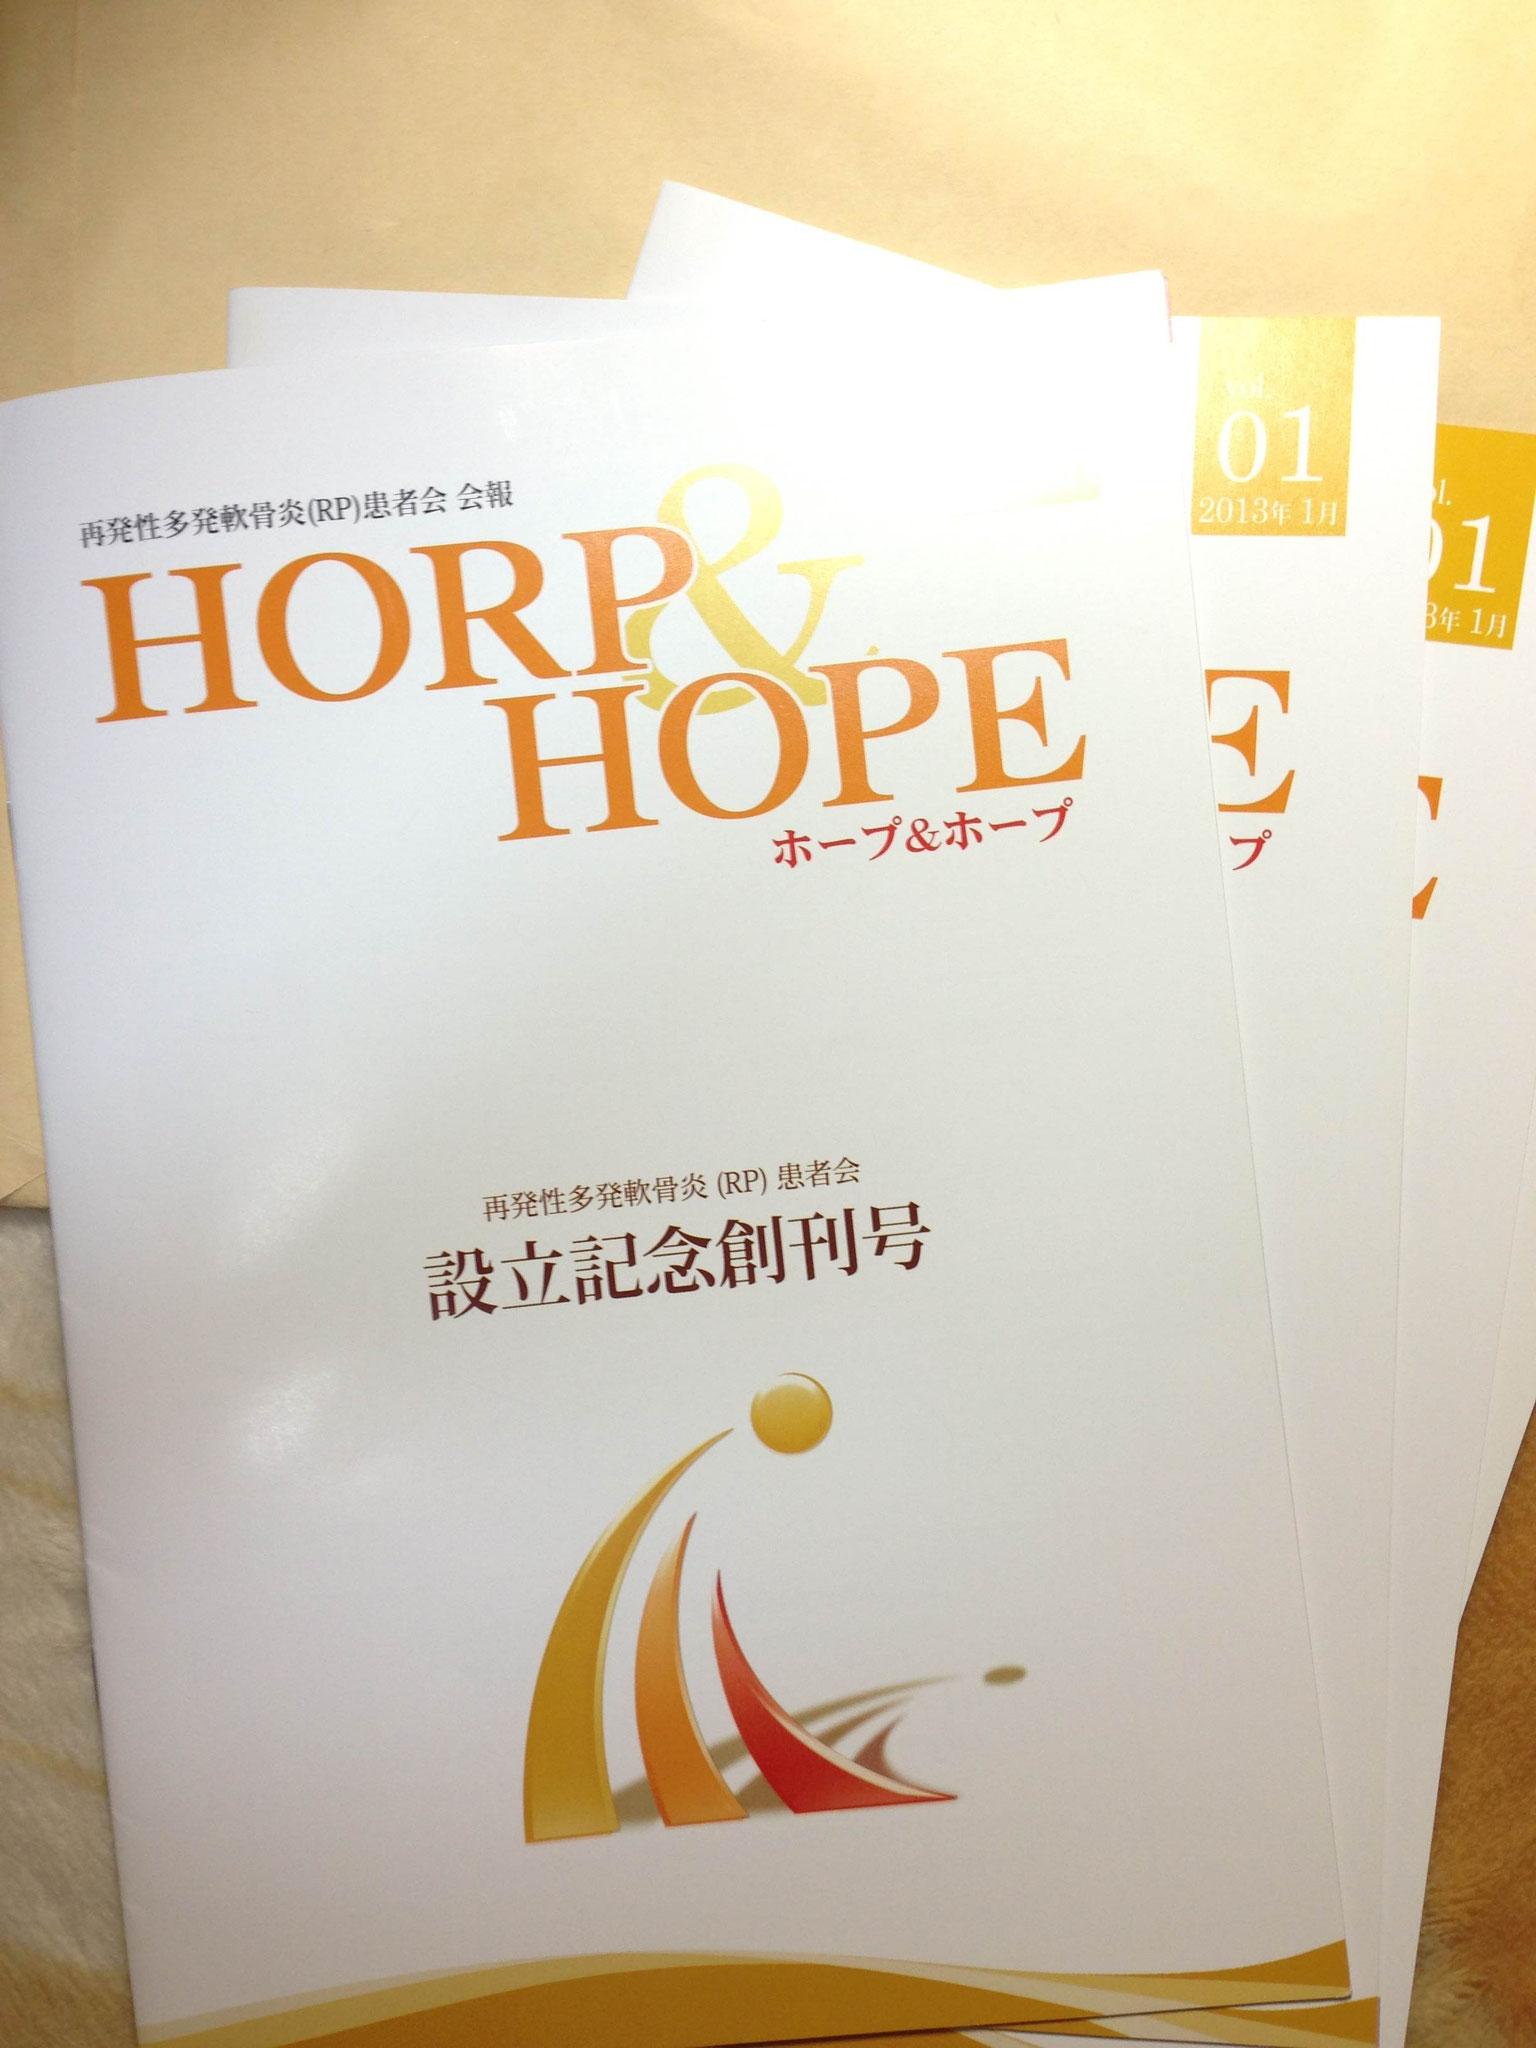 2013年1月 会報「HORP&HOPE」 第1号創刊